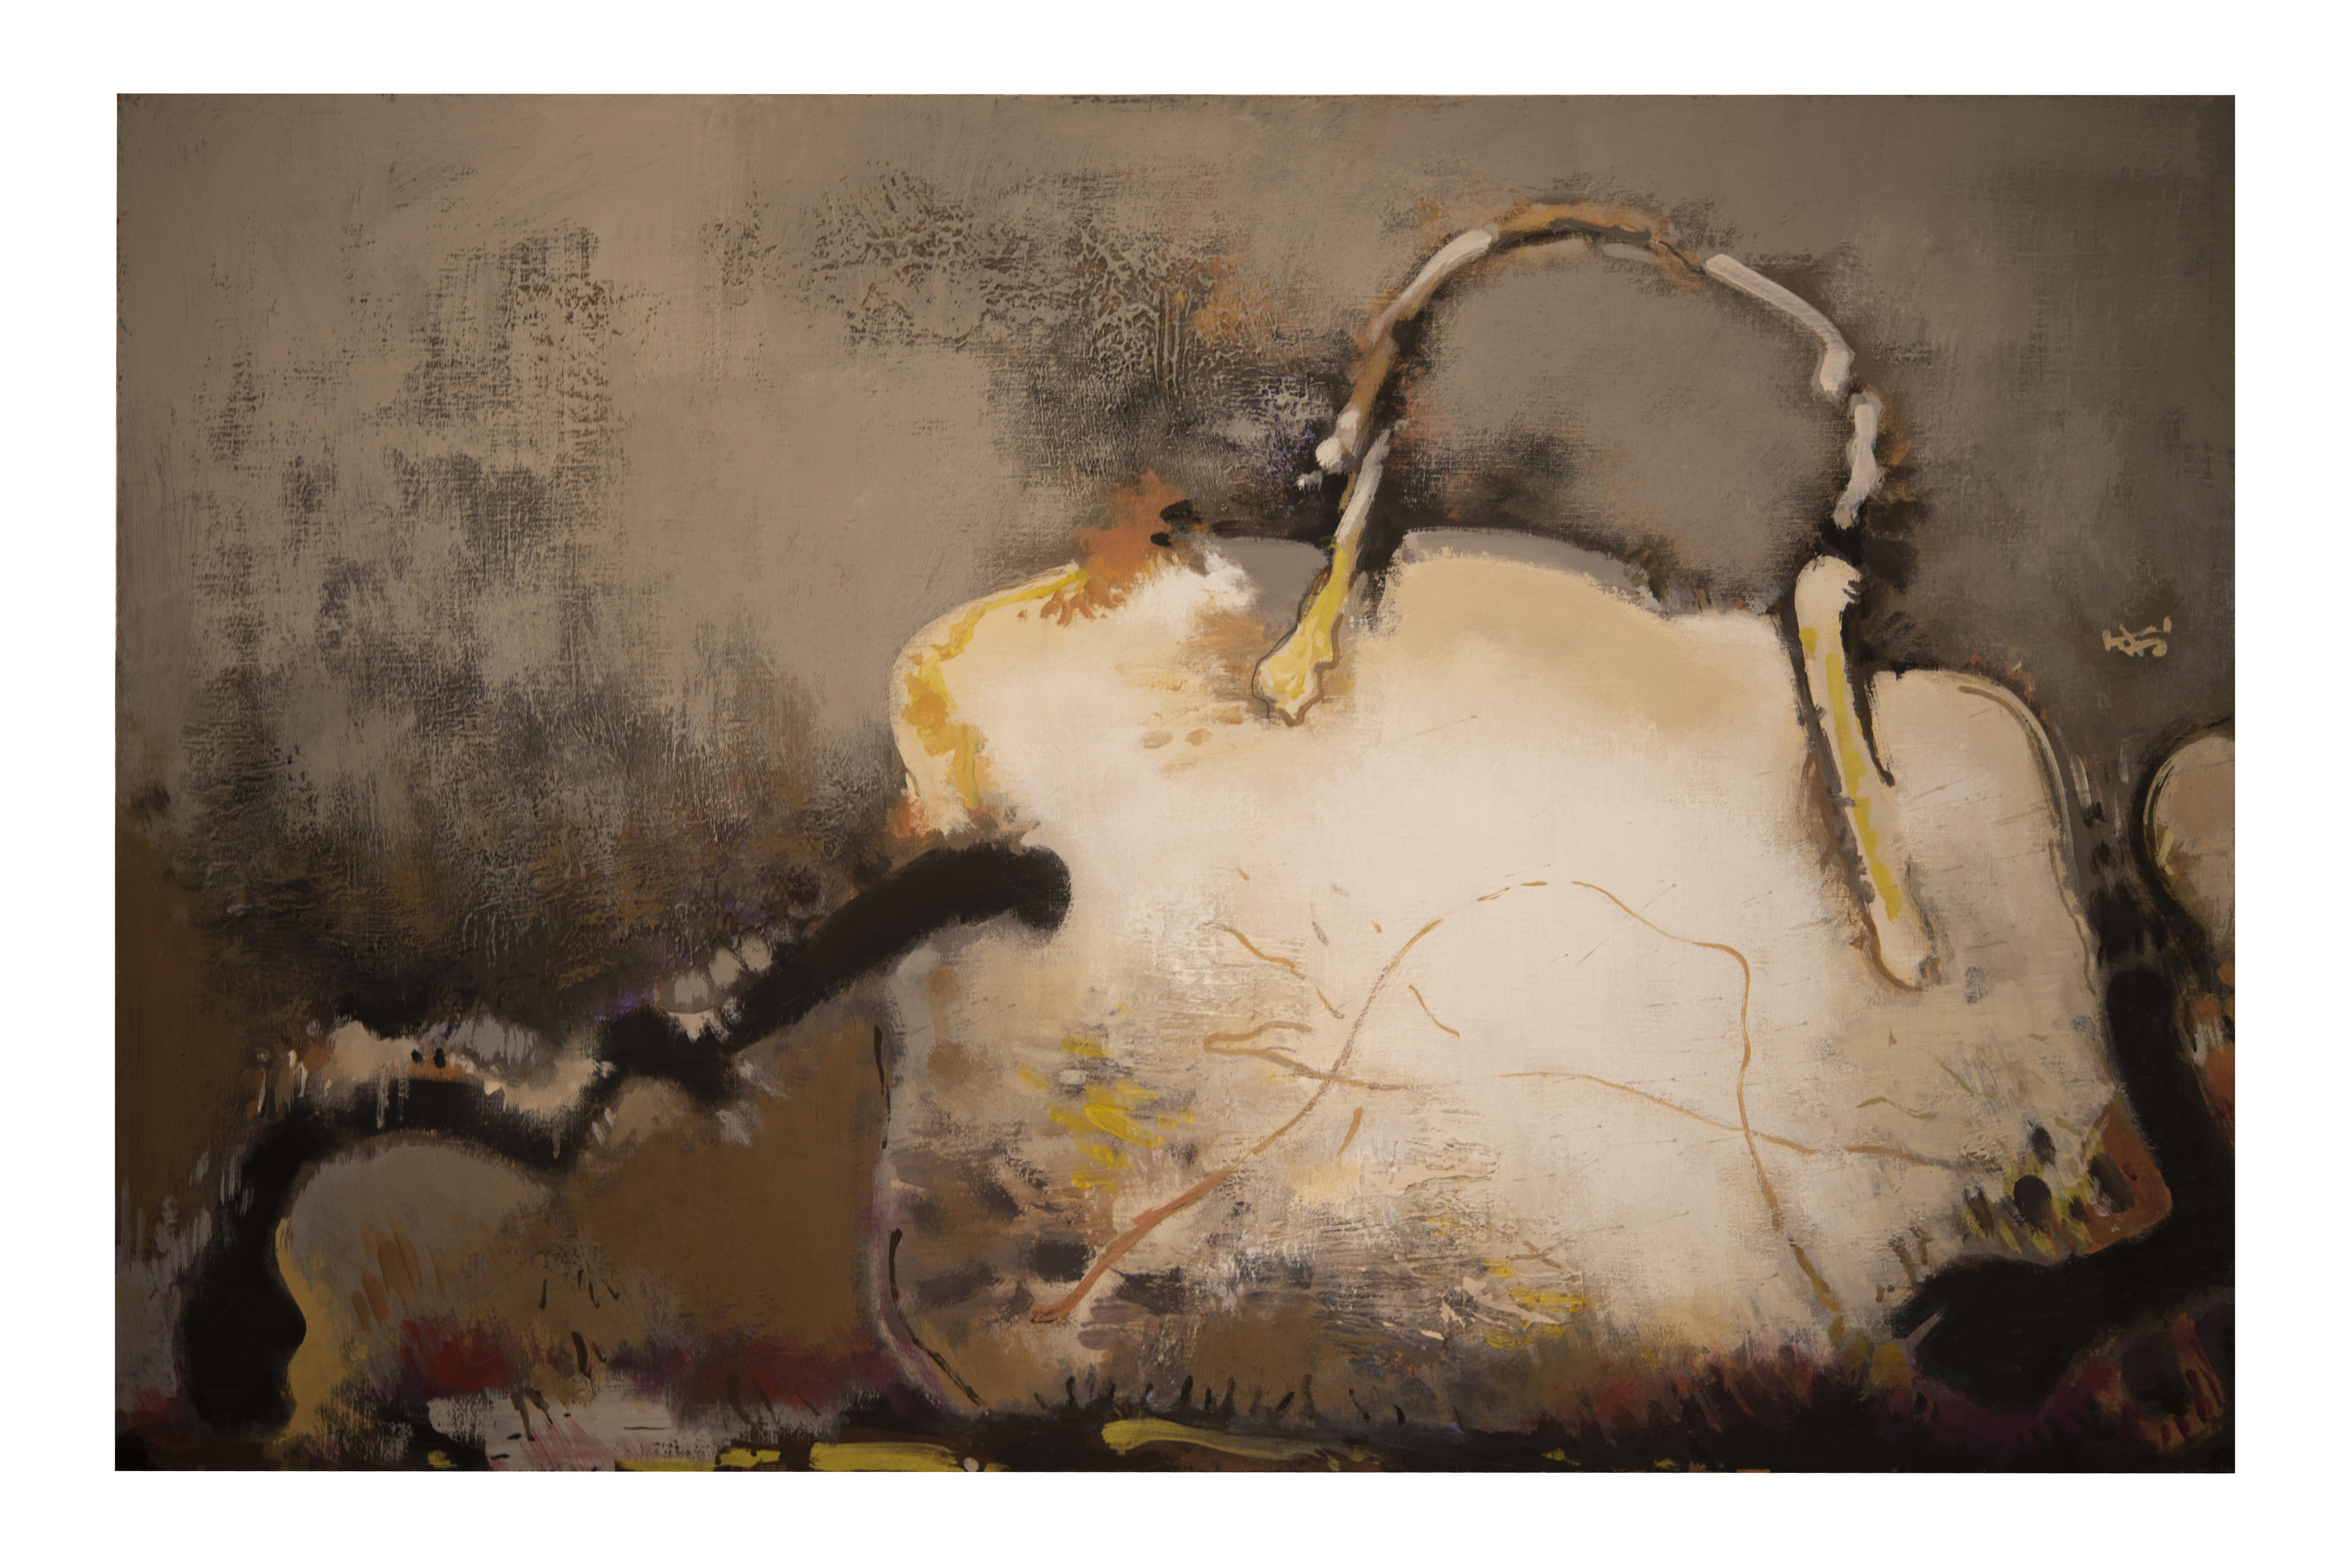 #172 Victor Chernilesvky (1958), Bag and Armchair | Victor Chernilesvky (1958), Bag and Armchair Image